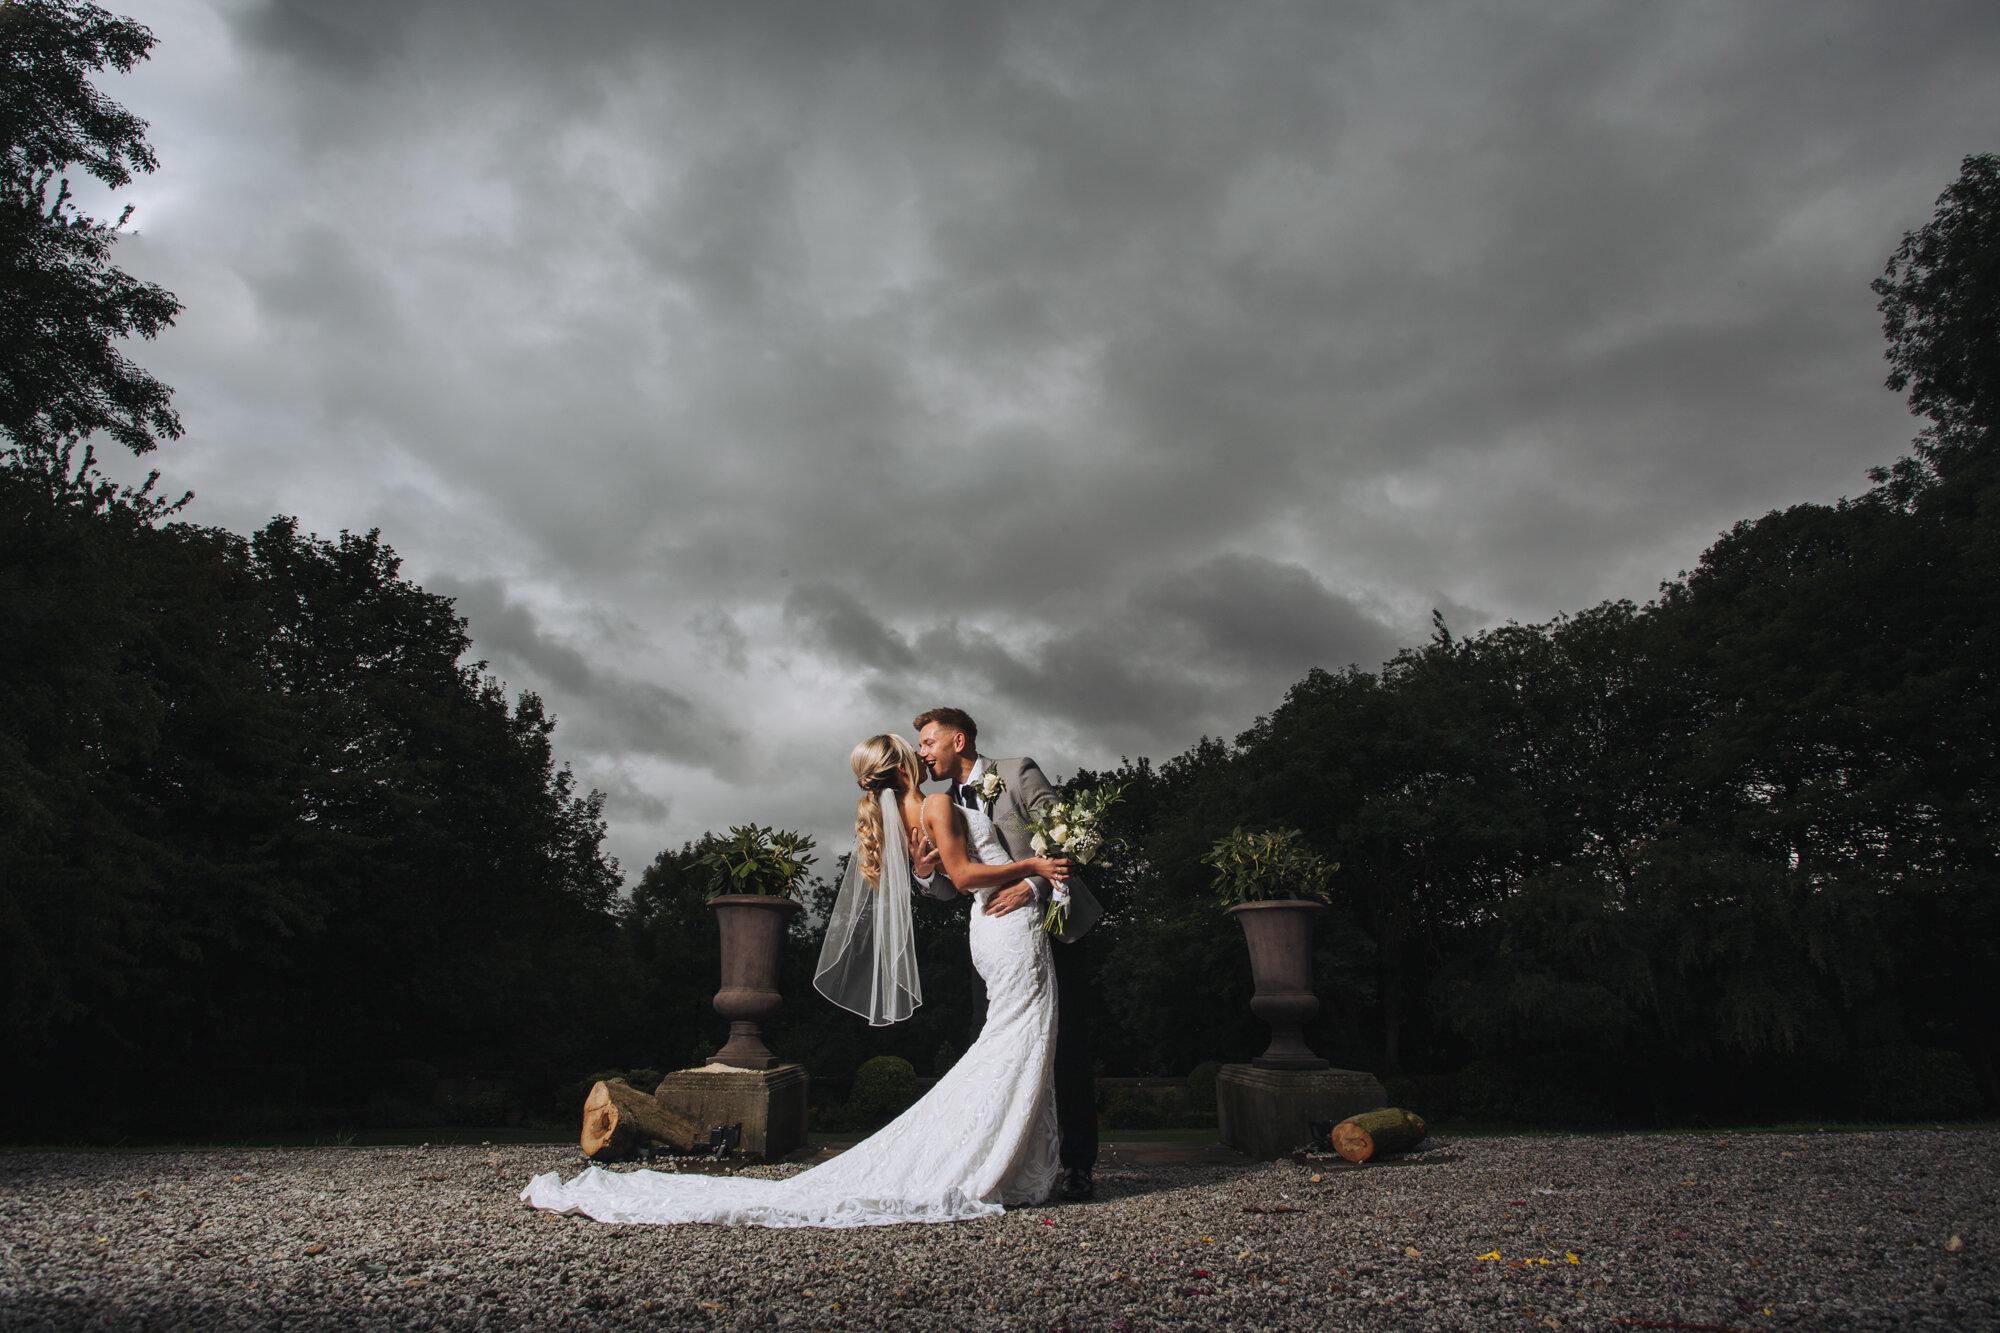 woodlands hotel leeds wedding photographer12.jpg